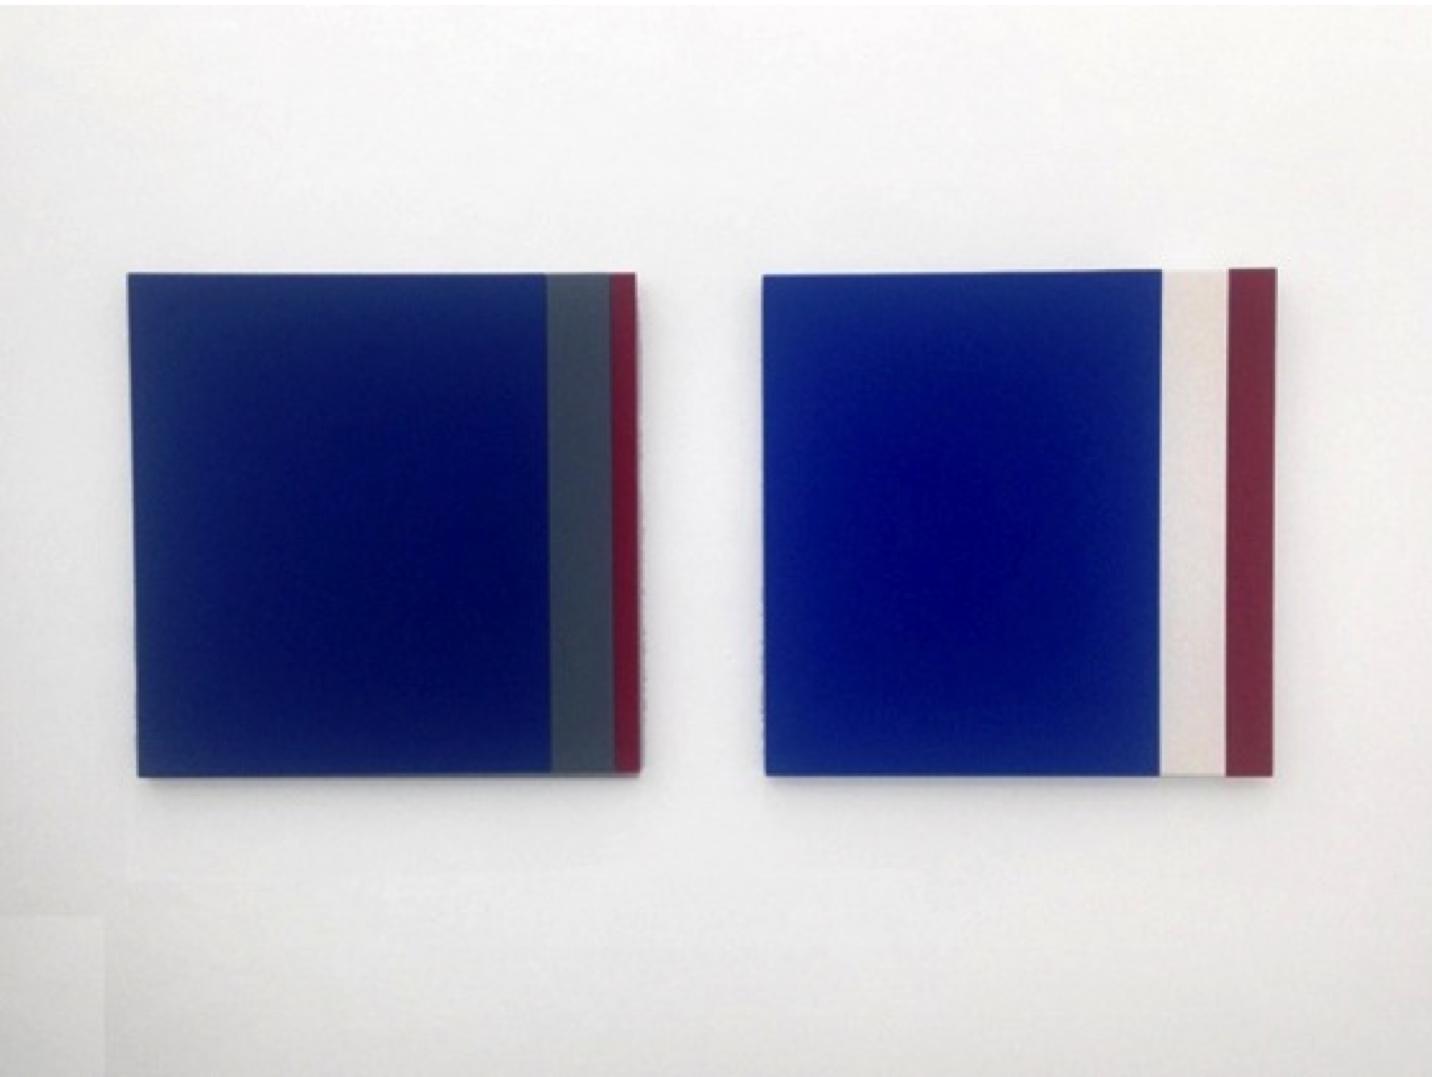 Emilio Chapela, Nasa - Pockocmoc, lacquer on wood, 50 x 50 cm ea, 2013